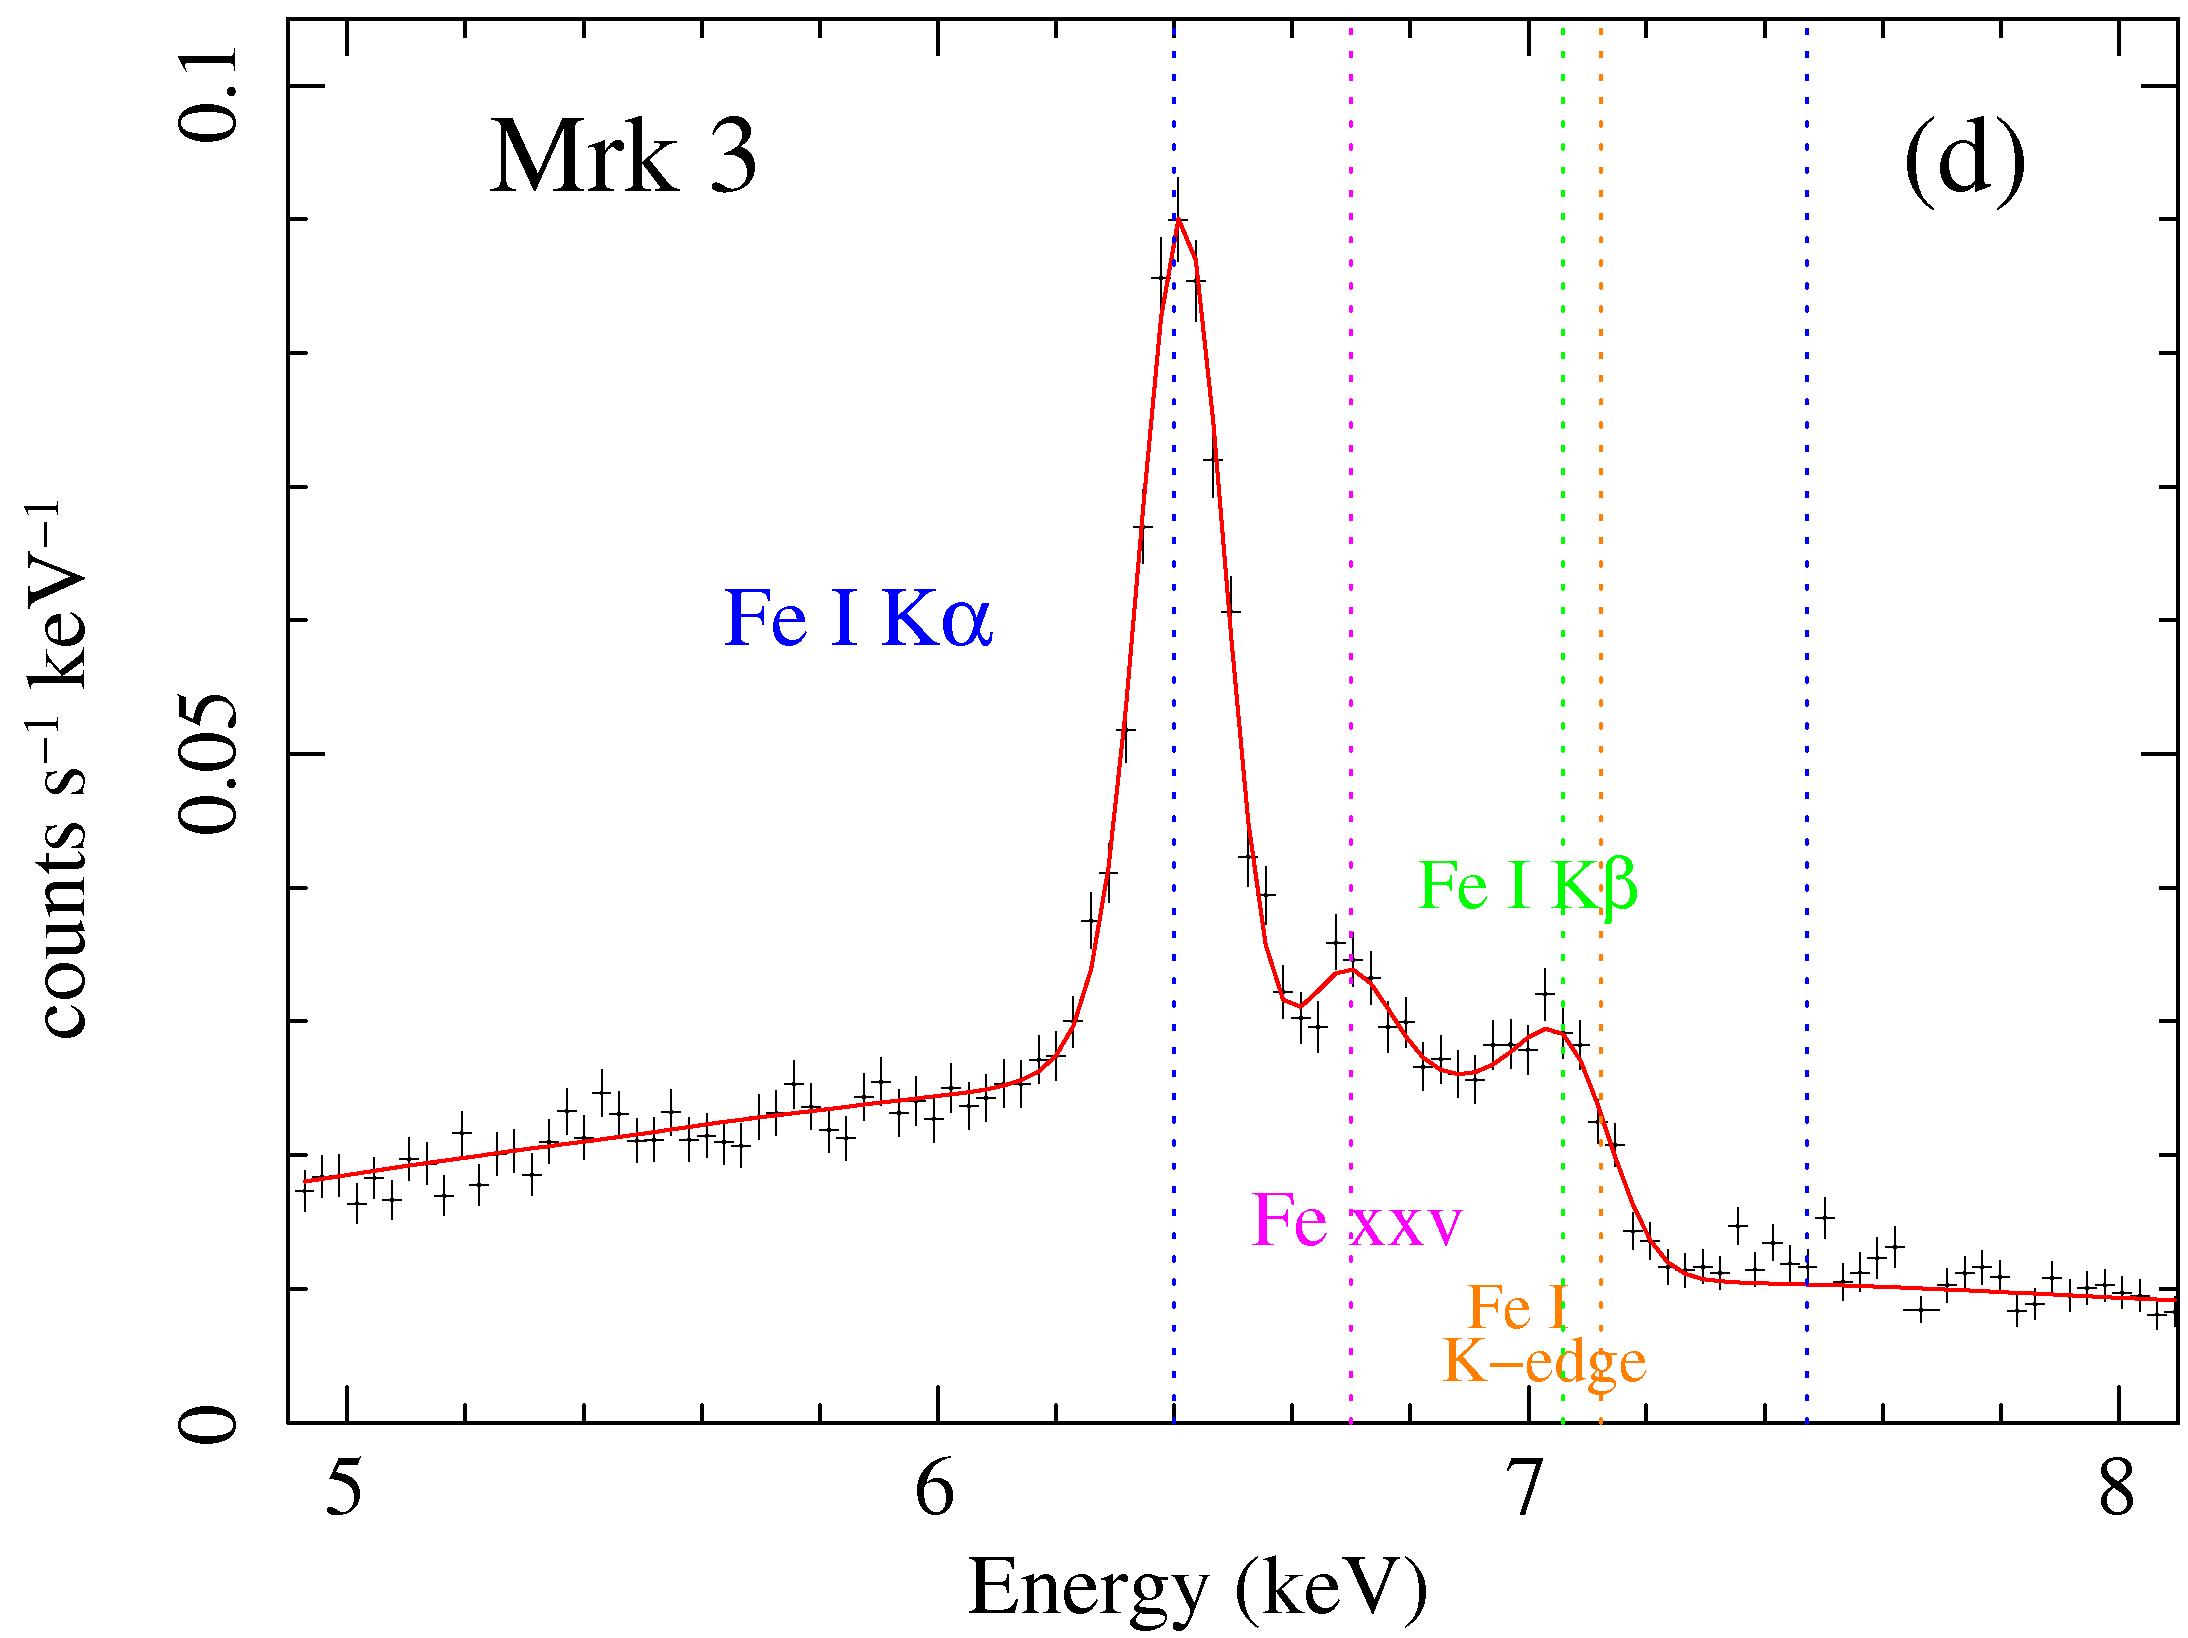 MYTorus fit to Mkn 3 Suzaku data: Fe K alpha line region